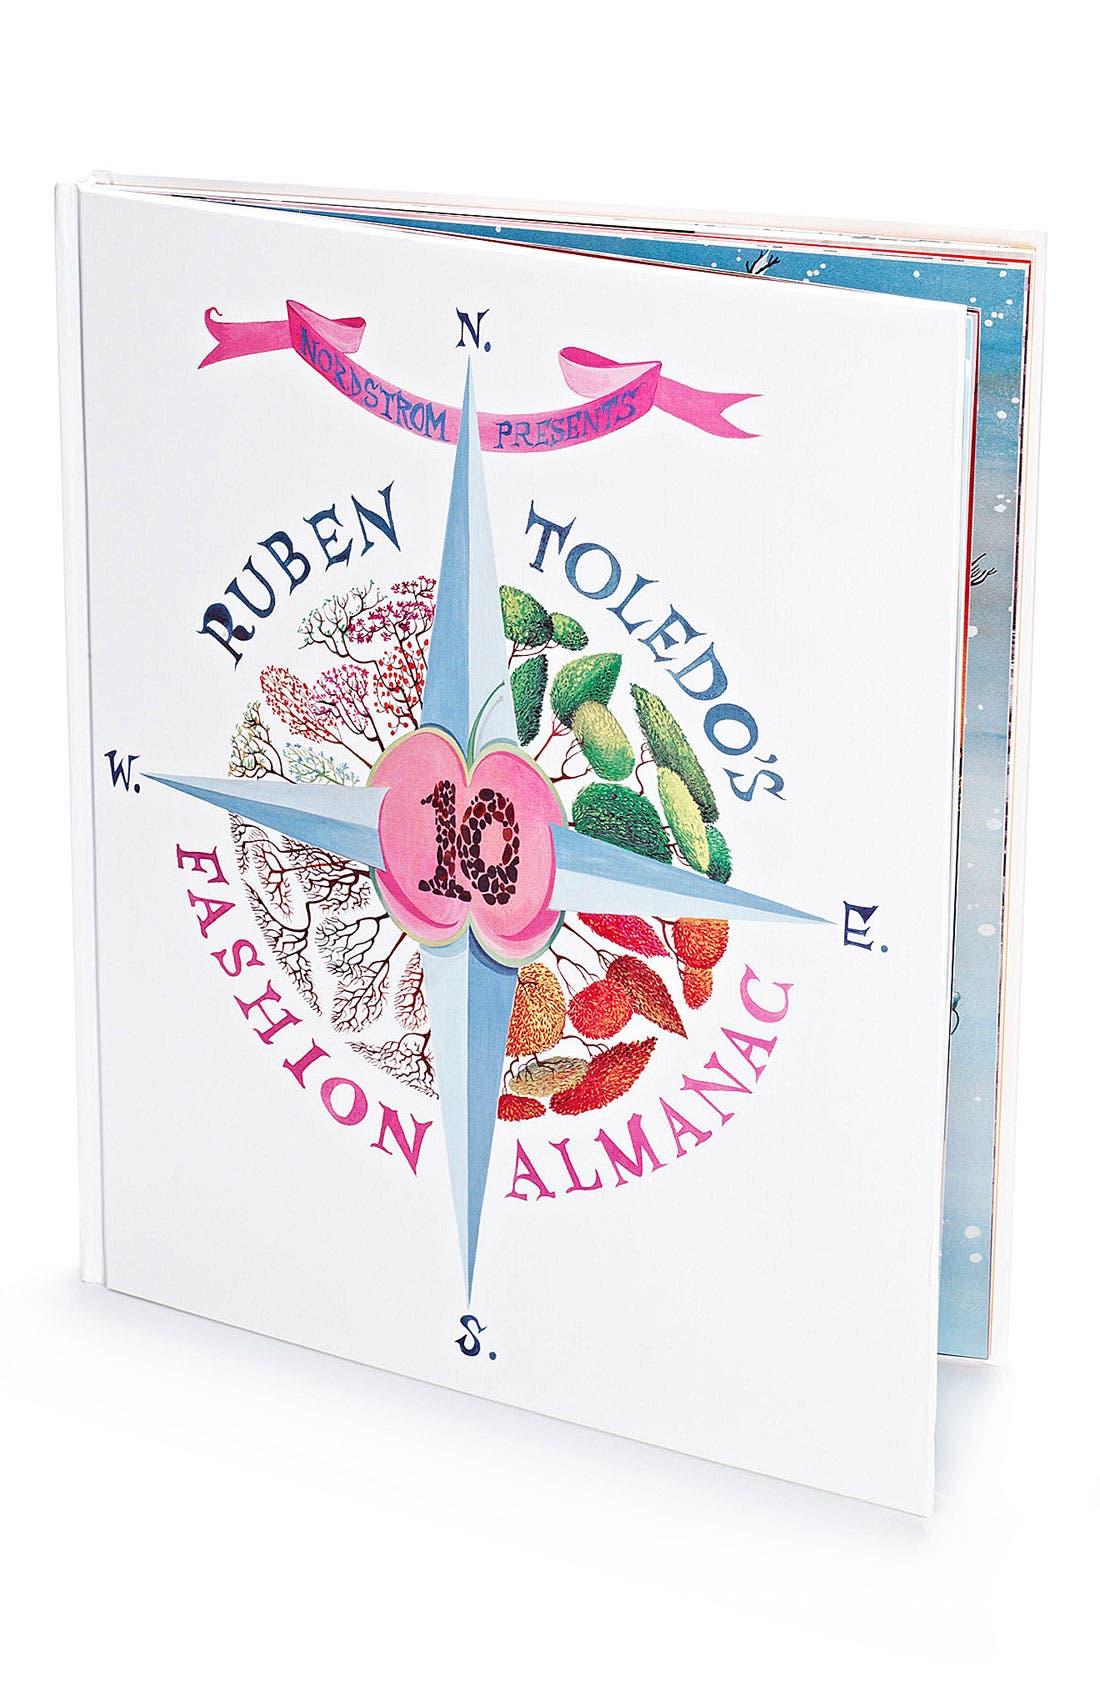 Main Image - Ruben Toledo's Fashion Almanac Book (Nordstrom Exclusive)